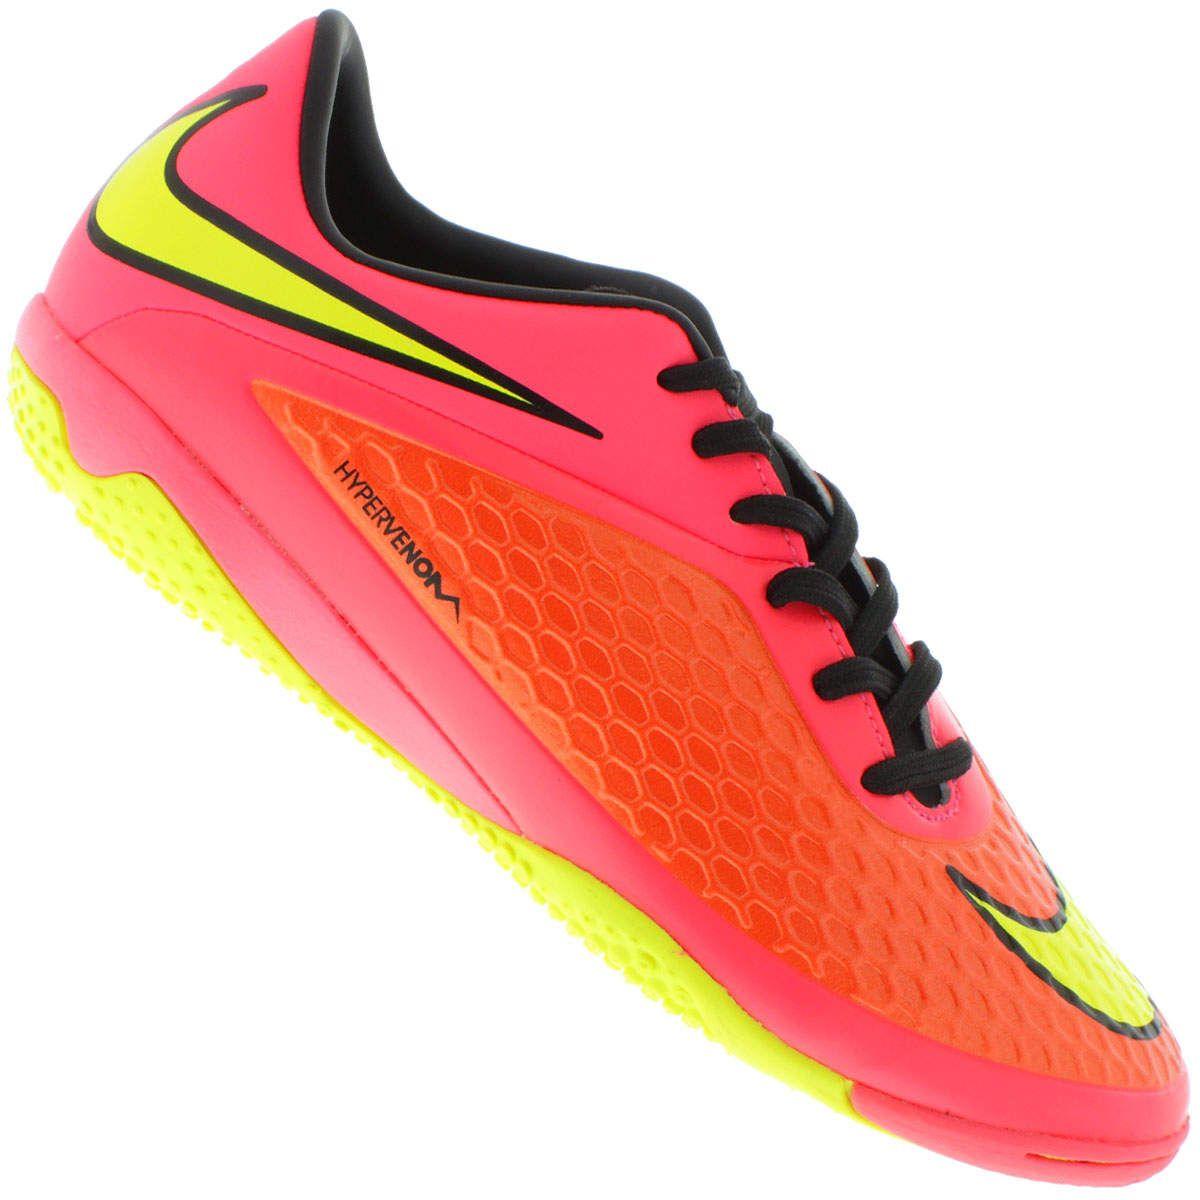 finest selection 5f86f 0e63a Centauro - Chuteira de Futsal Nike Hypervenom Phelon IC